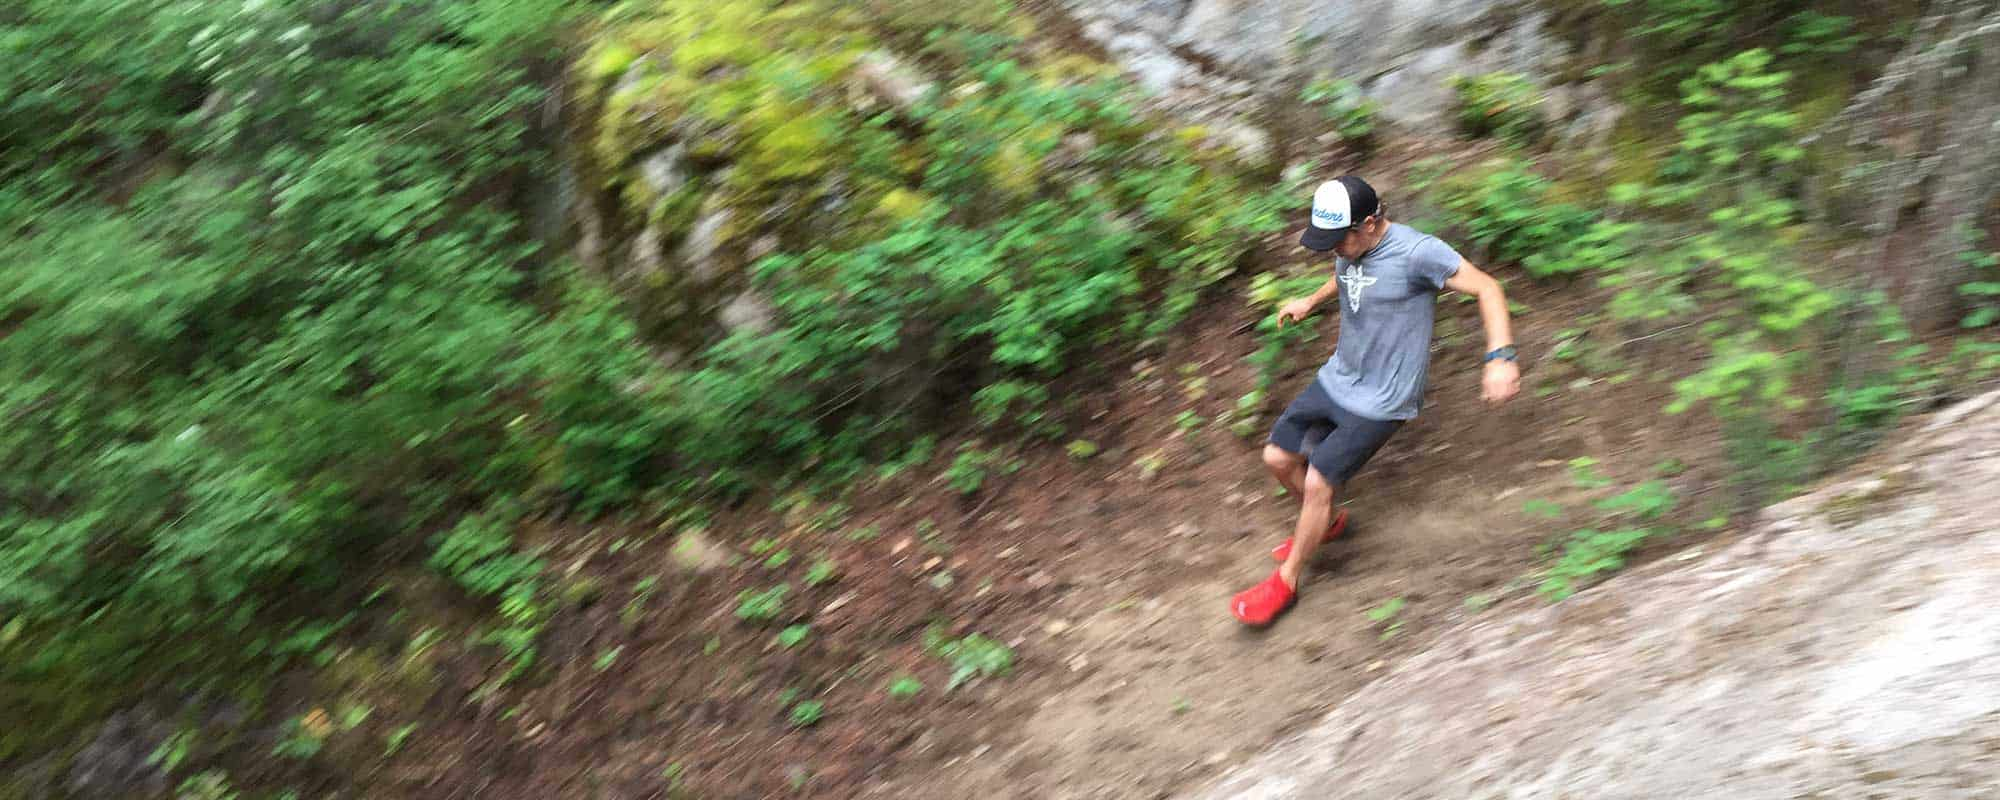 Salomon S-Lab Sense 6 SG Trail Running Shoes Reviewed